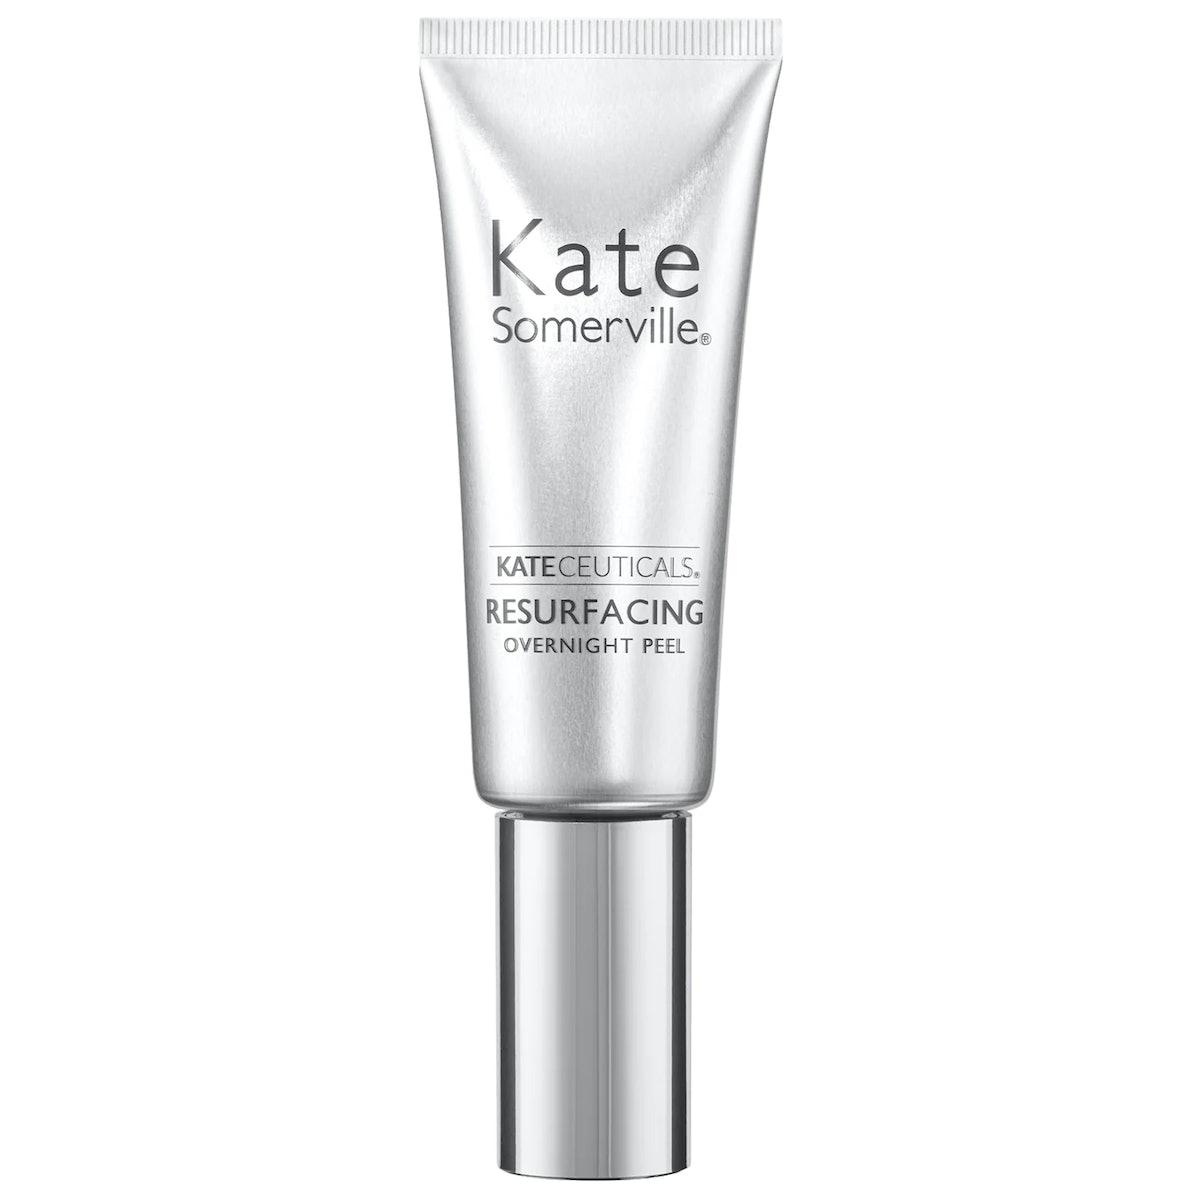 KateCeuticals Resurfacing Overnight Peel with Glycolic Acid, Retinol & Niacinamide